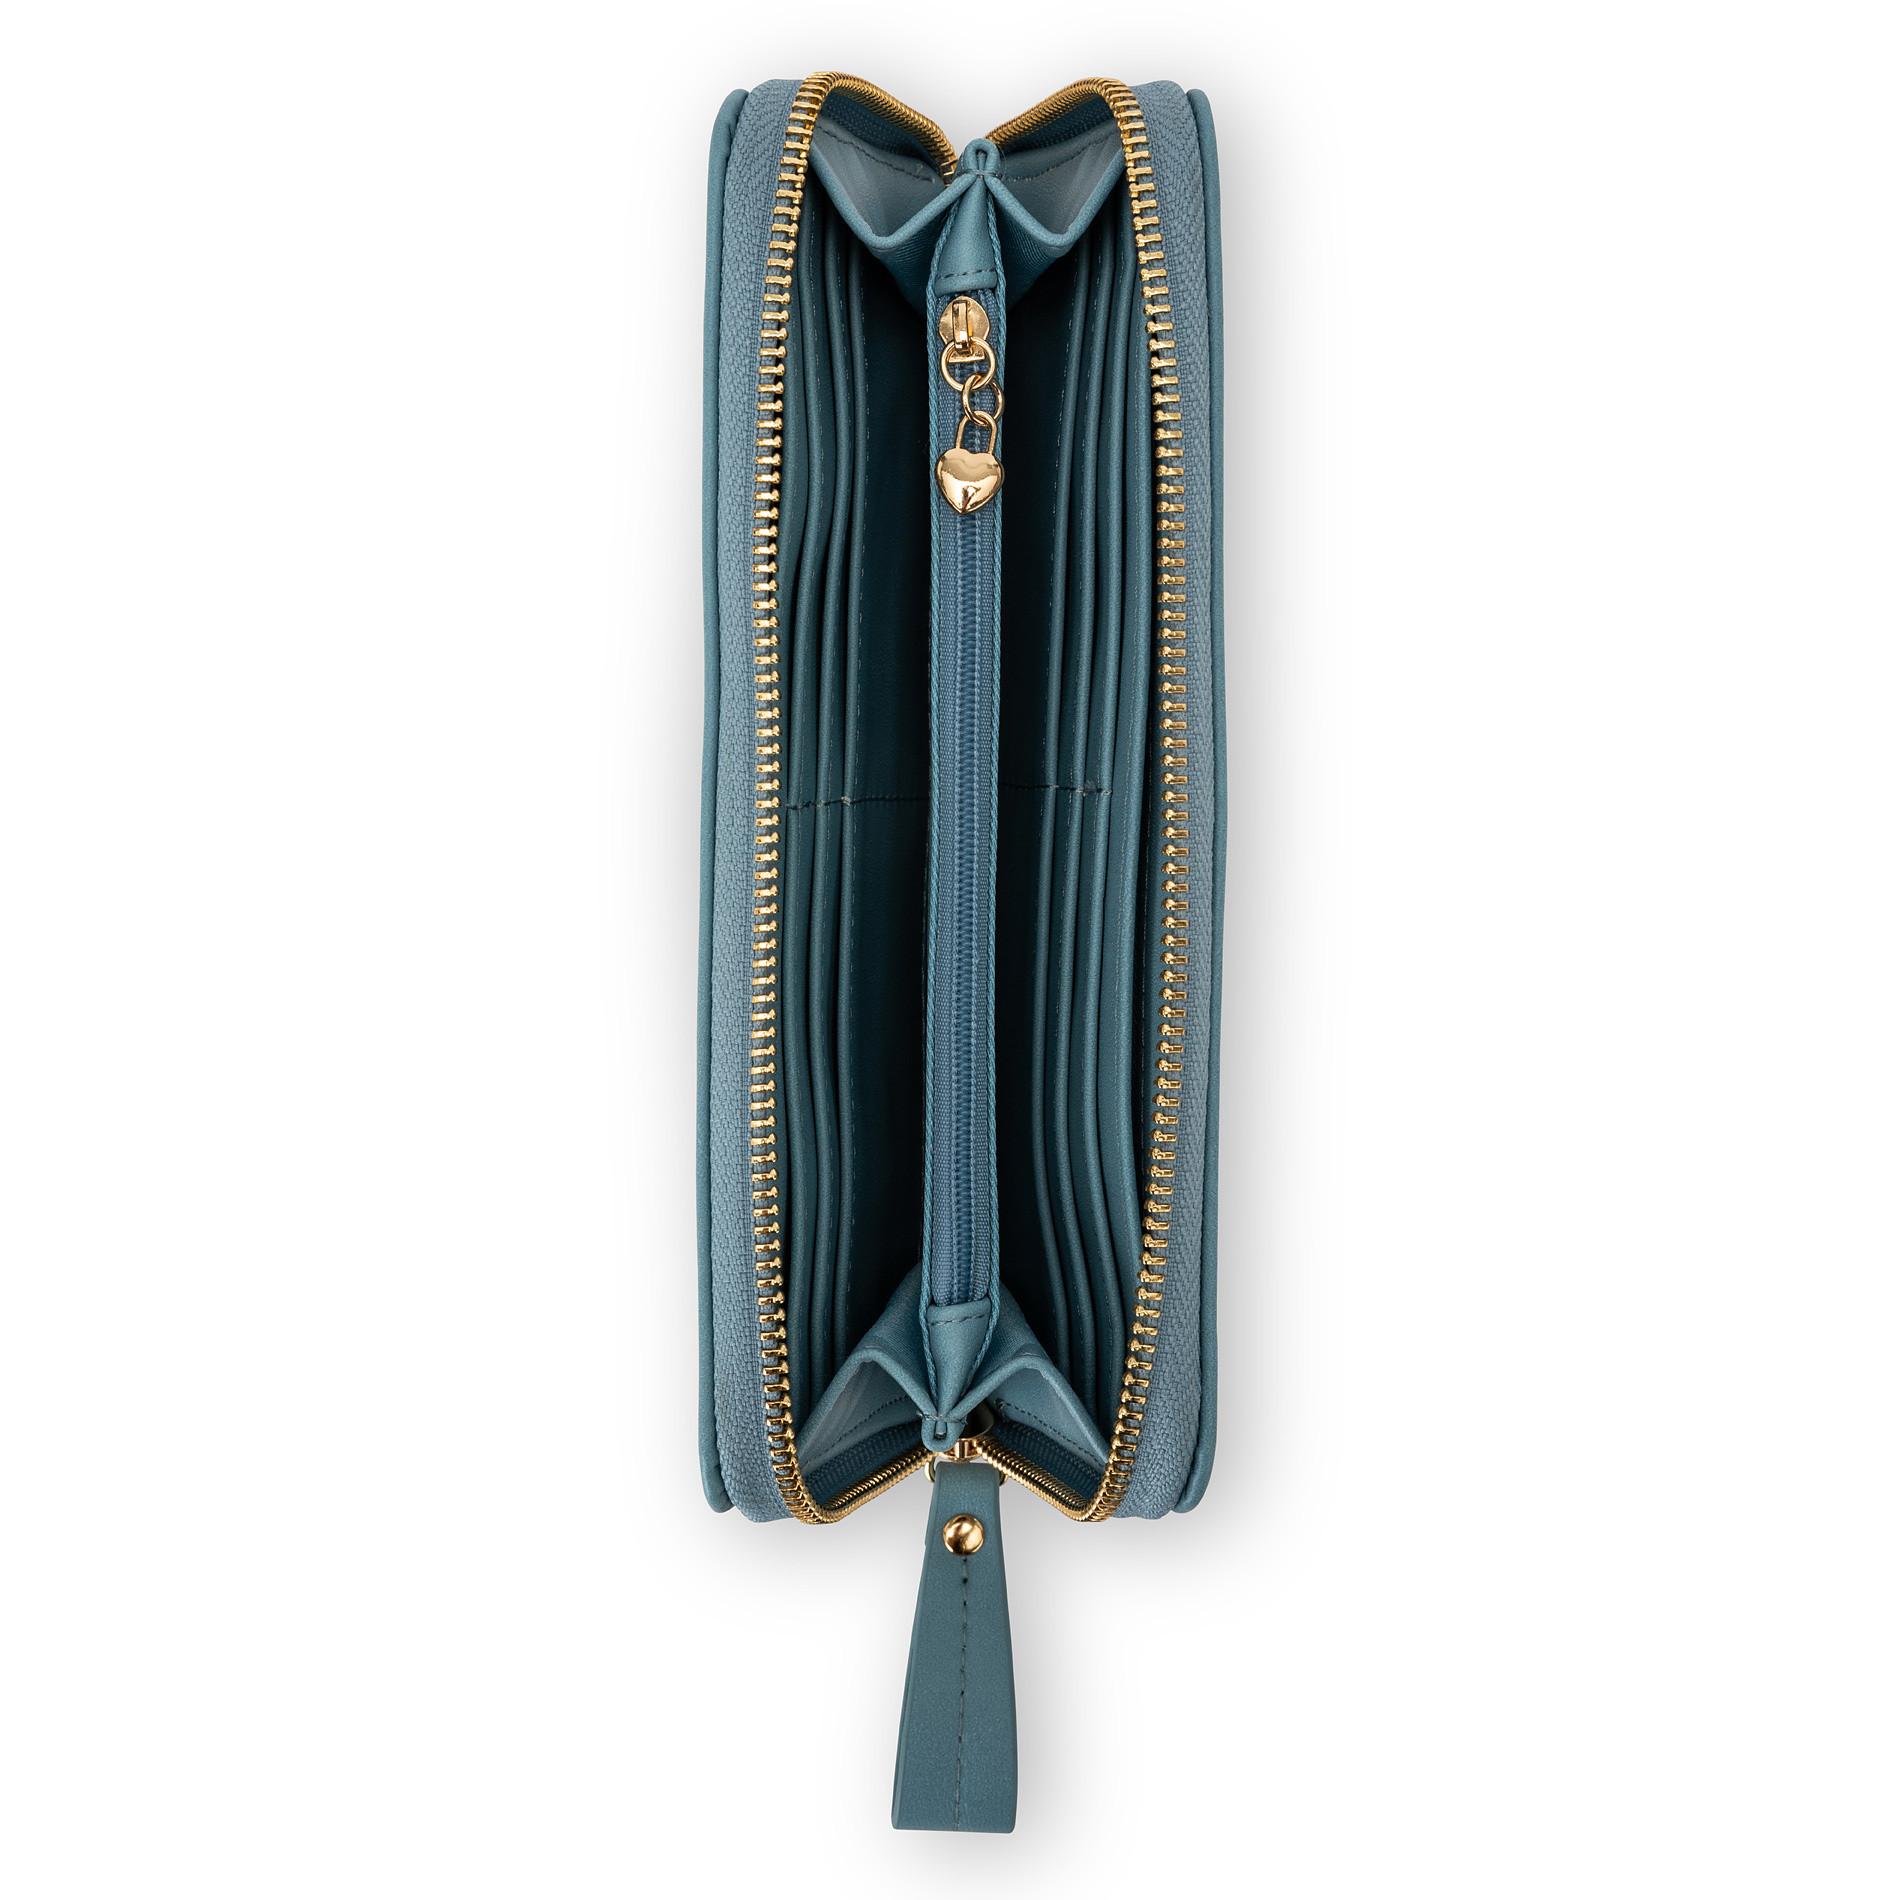 Portafoglio pelle sintetica Koan, Azzurro, large image number 2